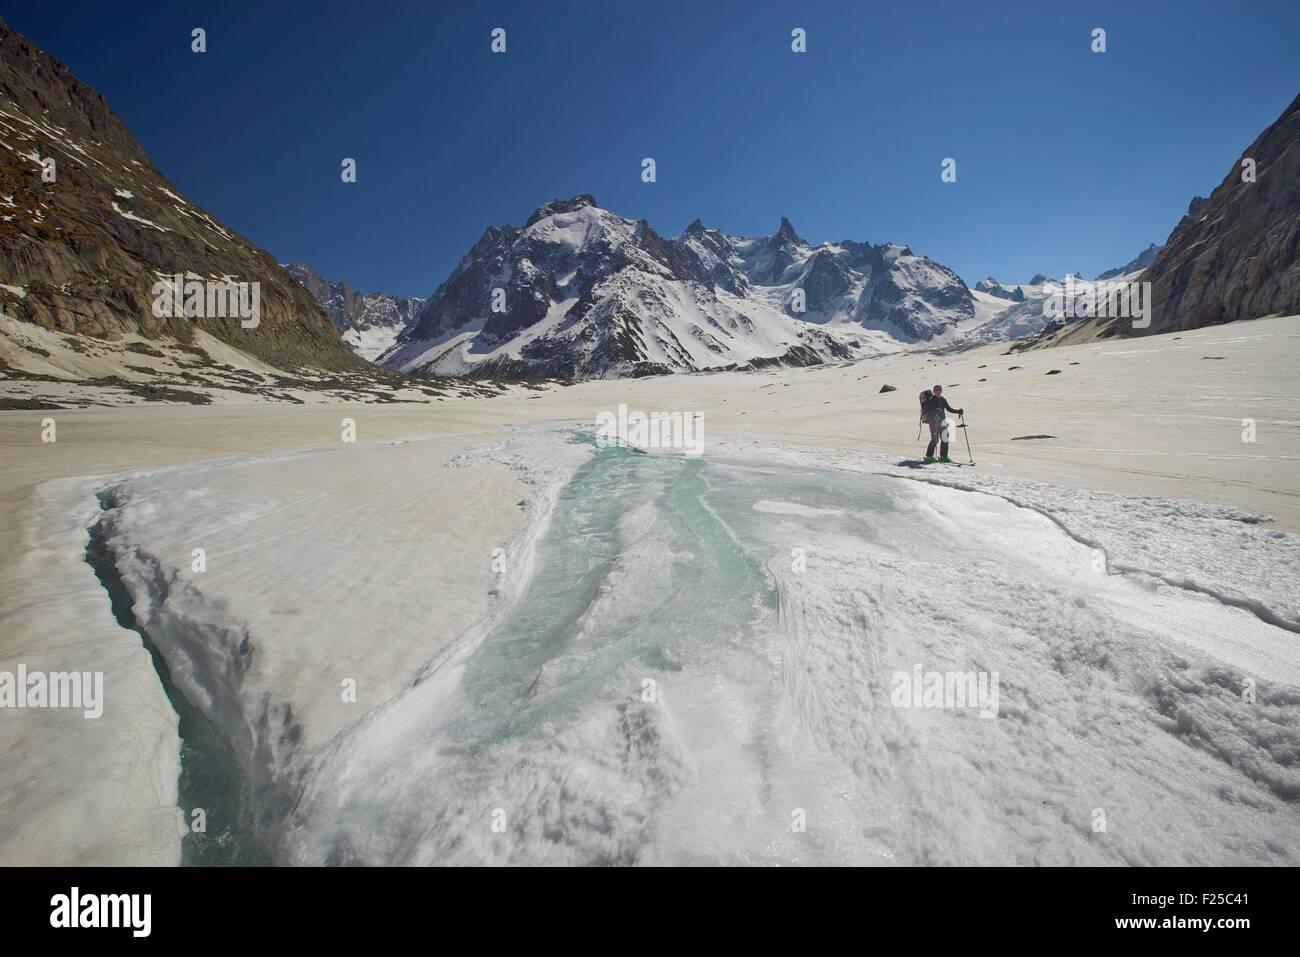 France, Haute Savoie, Chamonix, running water on the Mer de Glace, Mont Blanc range - Stock Image